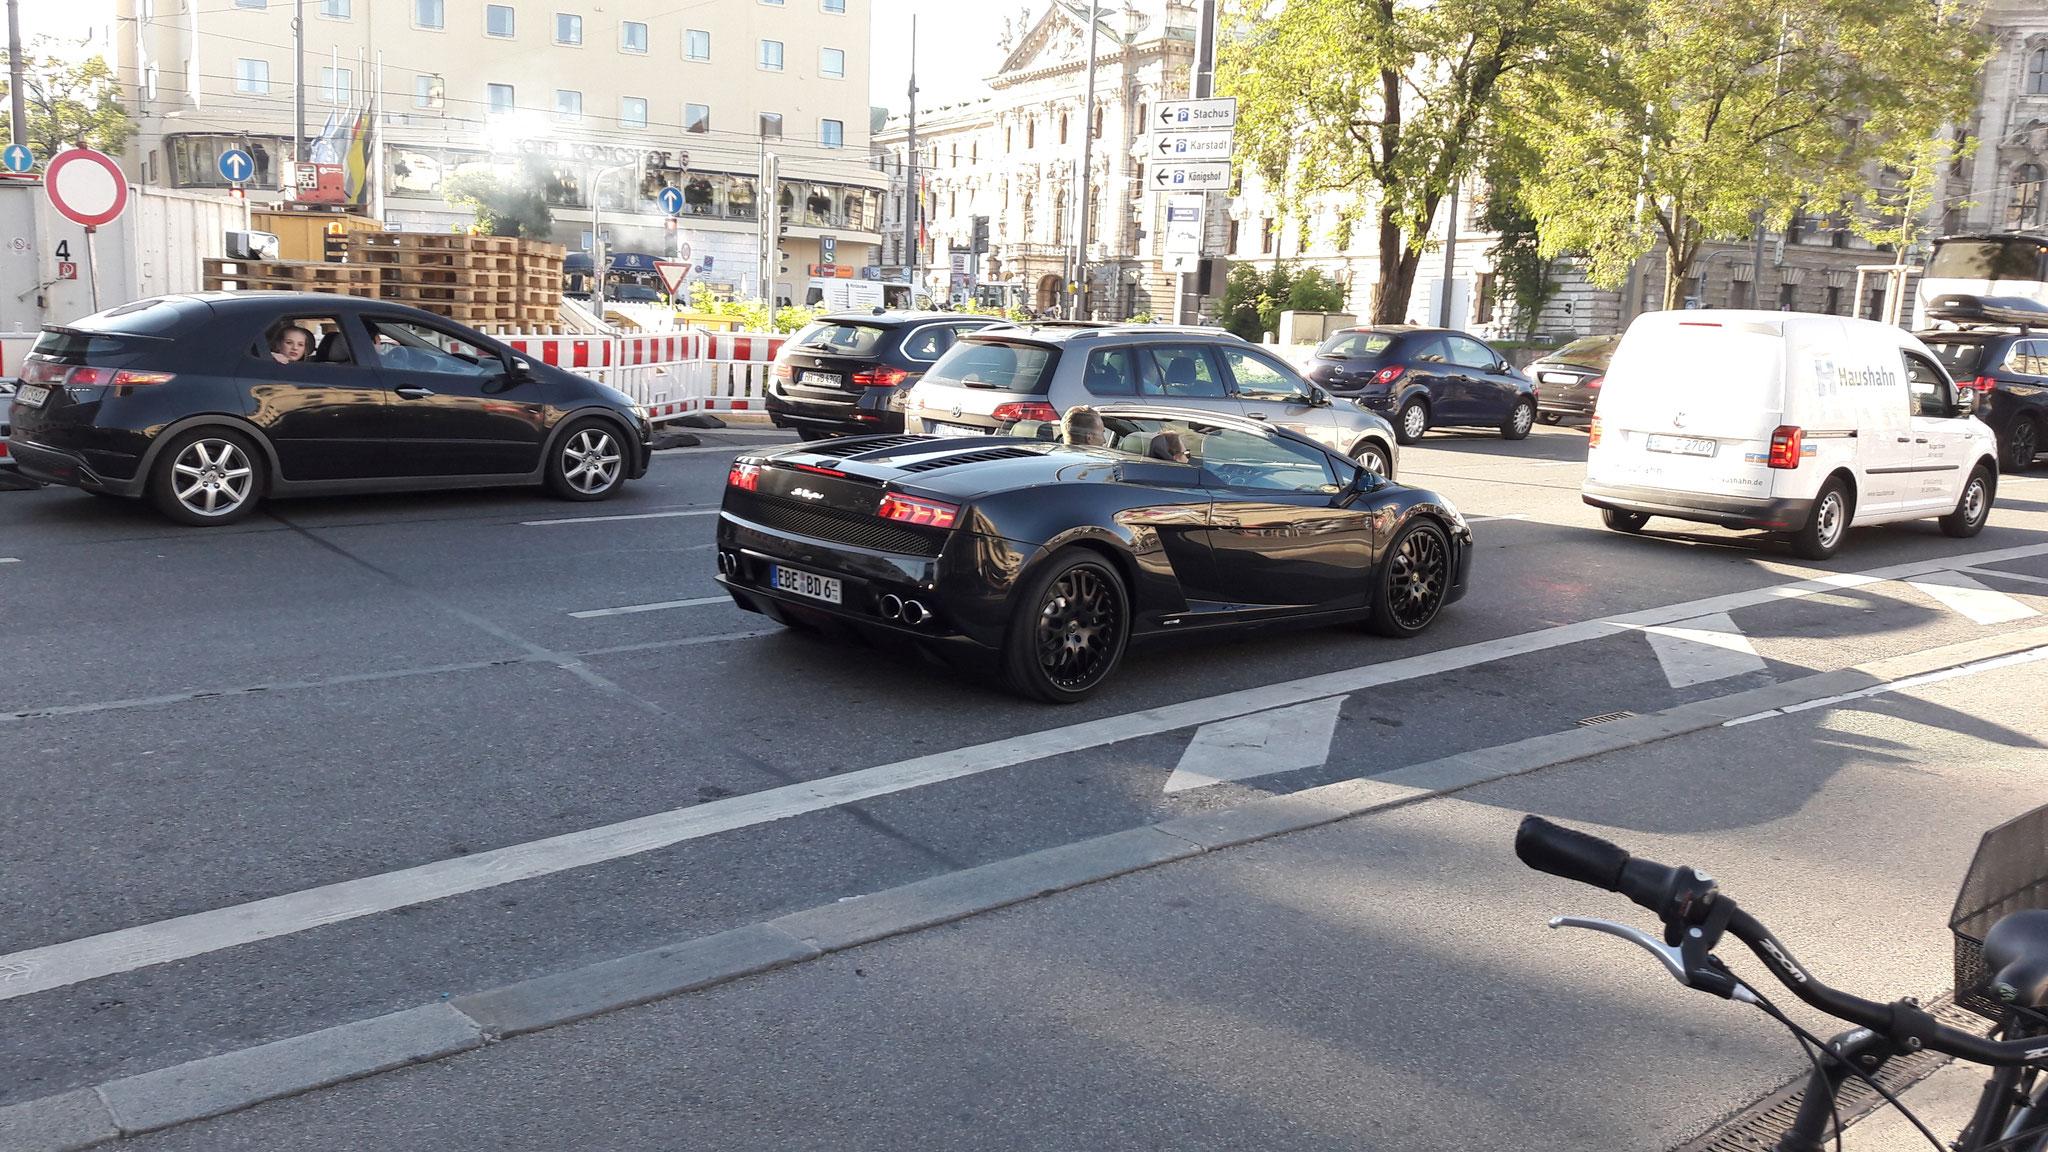 Lamborghini Gallardo LP 550 Spyder - EBE-BD-6